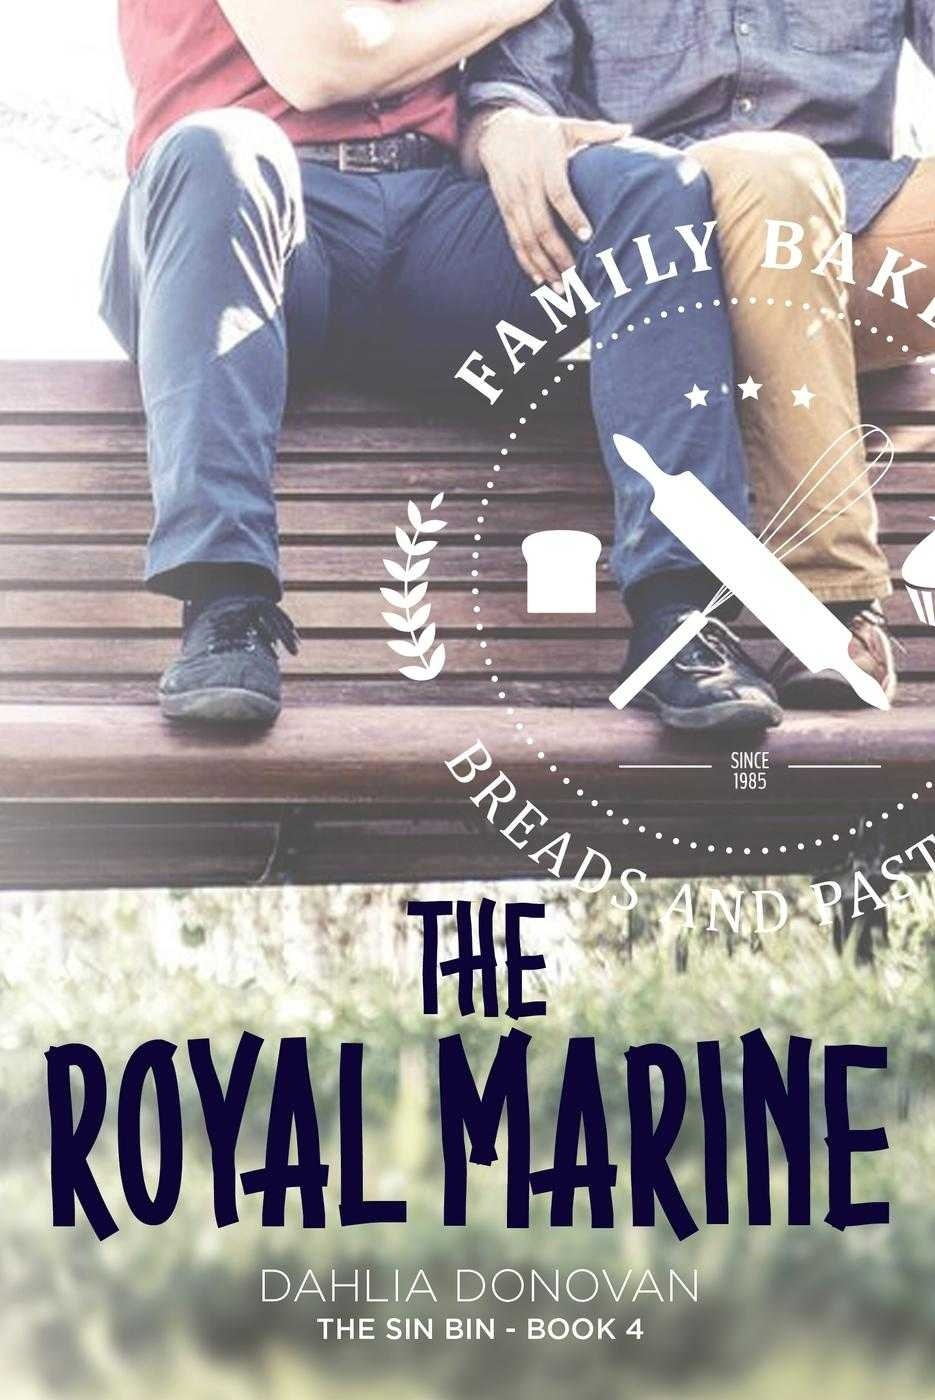 MOBI The Royal Marine by Dahlia Donovan